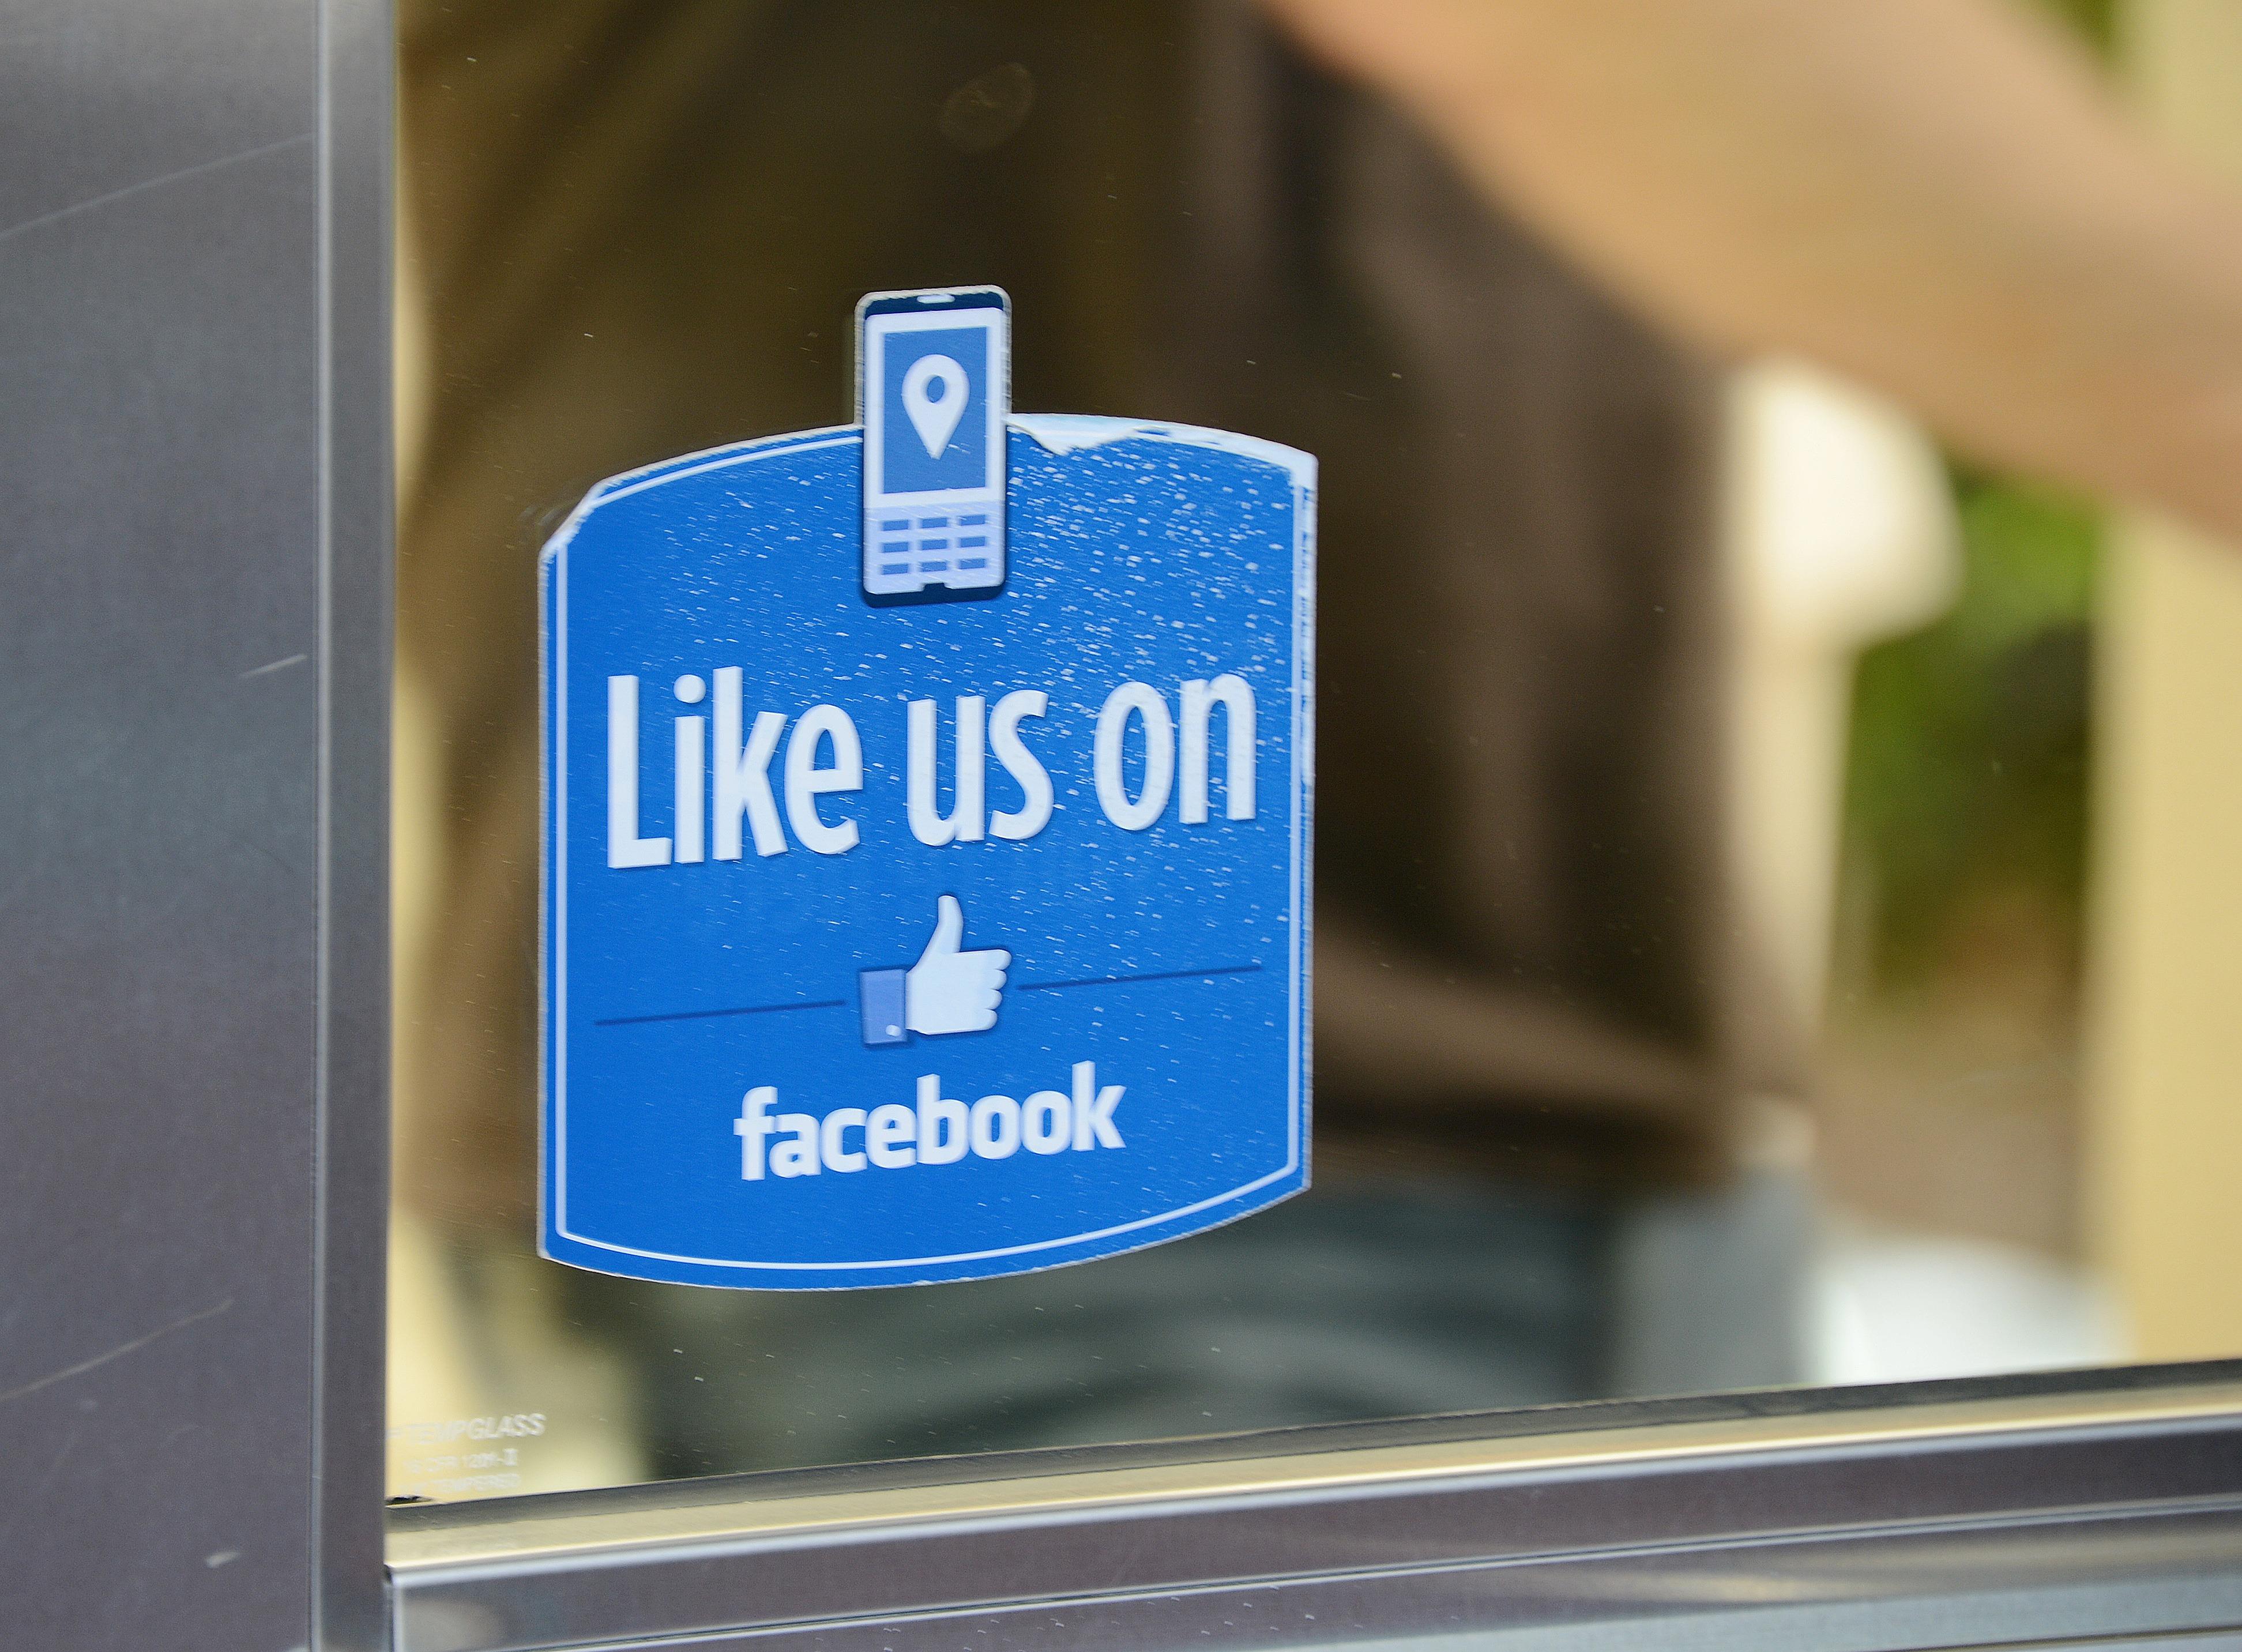 6 Random Social Media Tips to Help You Improve Your Marketing Today